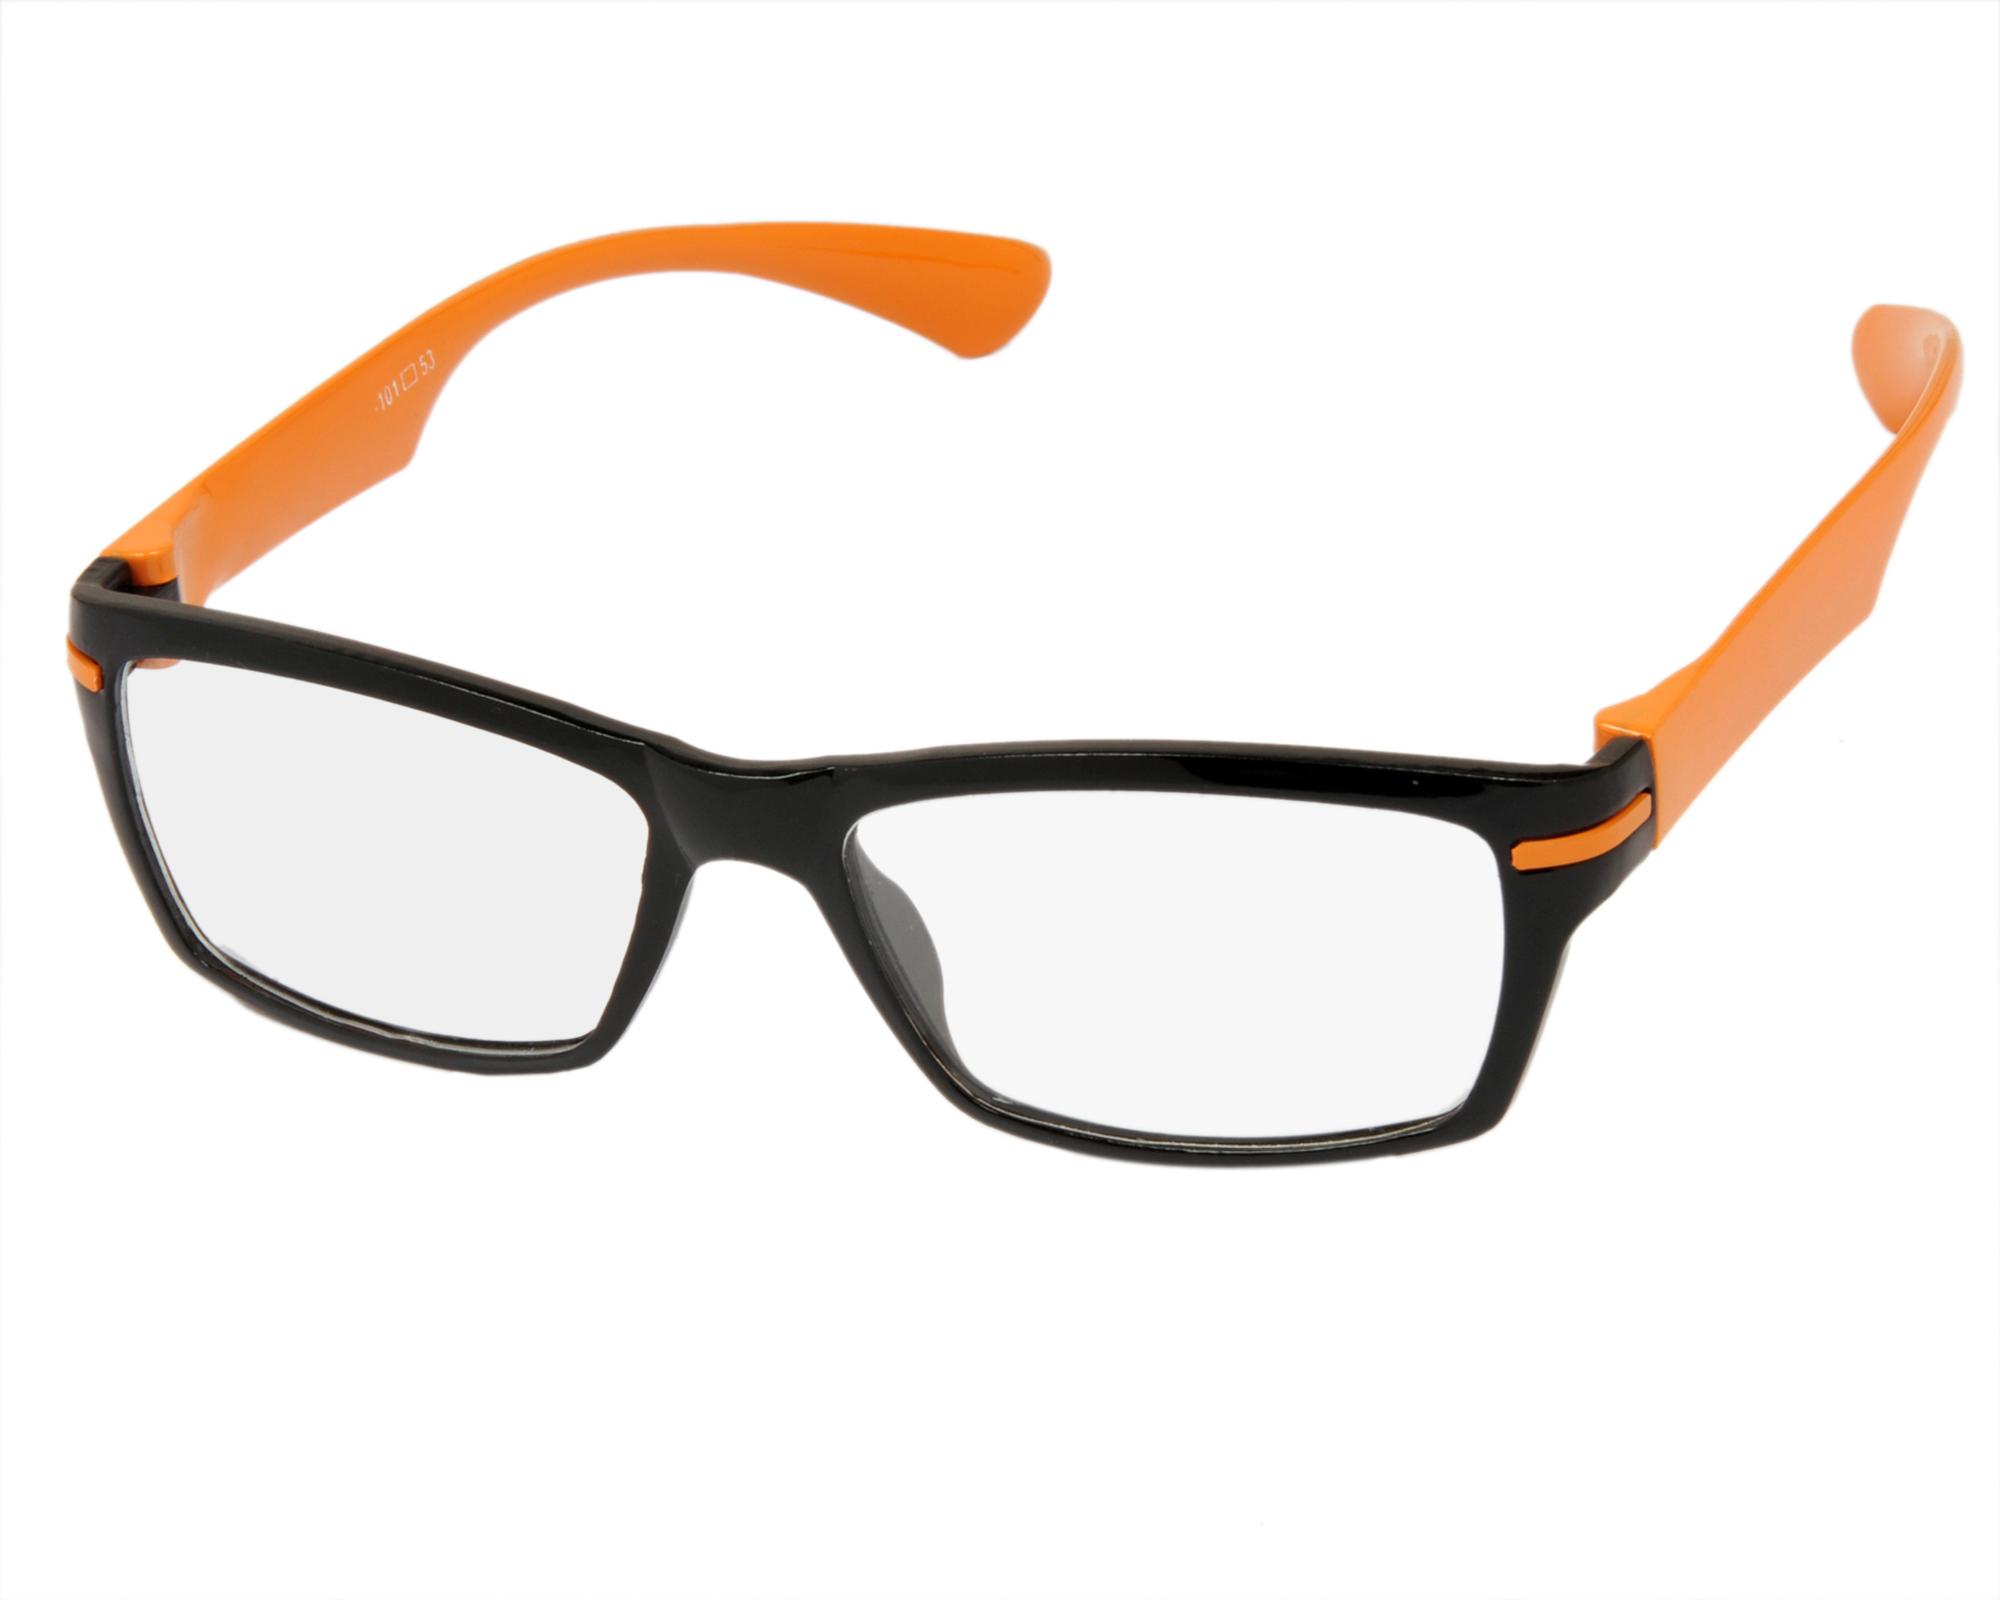 Eyeglasses Frame Temples : Aoito Black Front Orange Temples Spectacles Frames ...